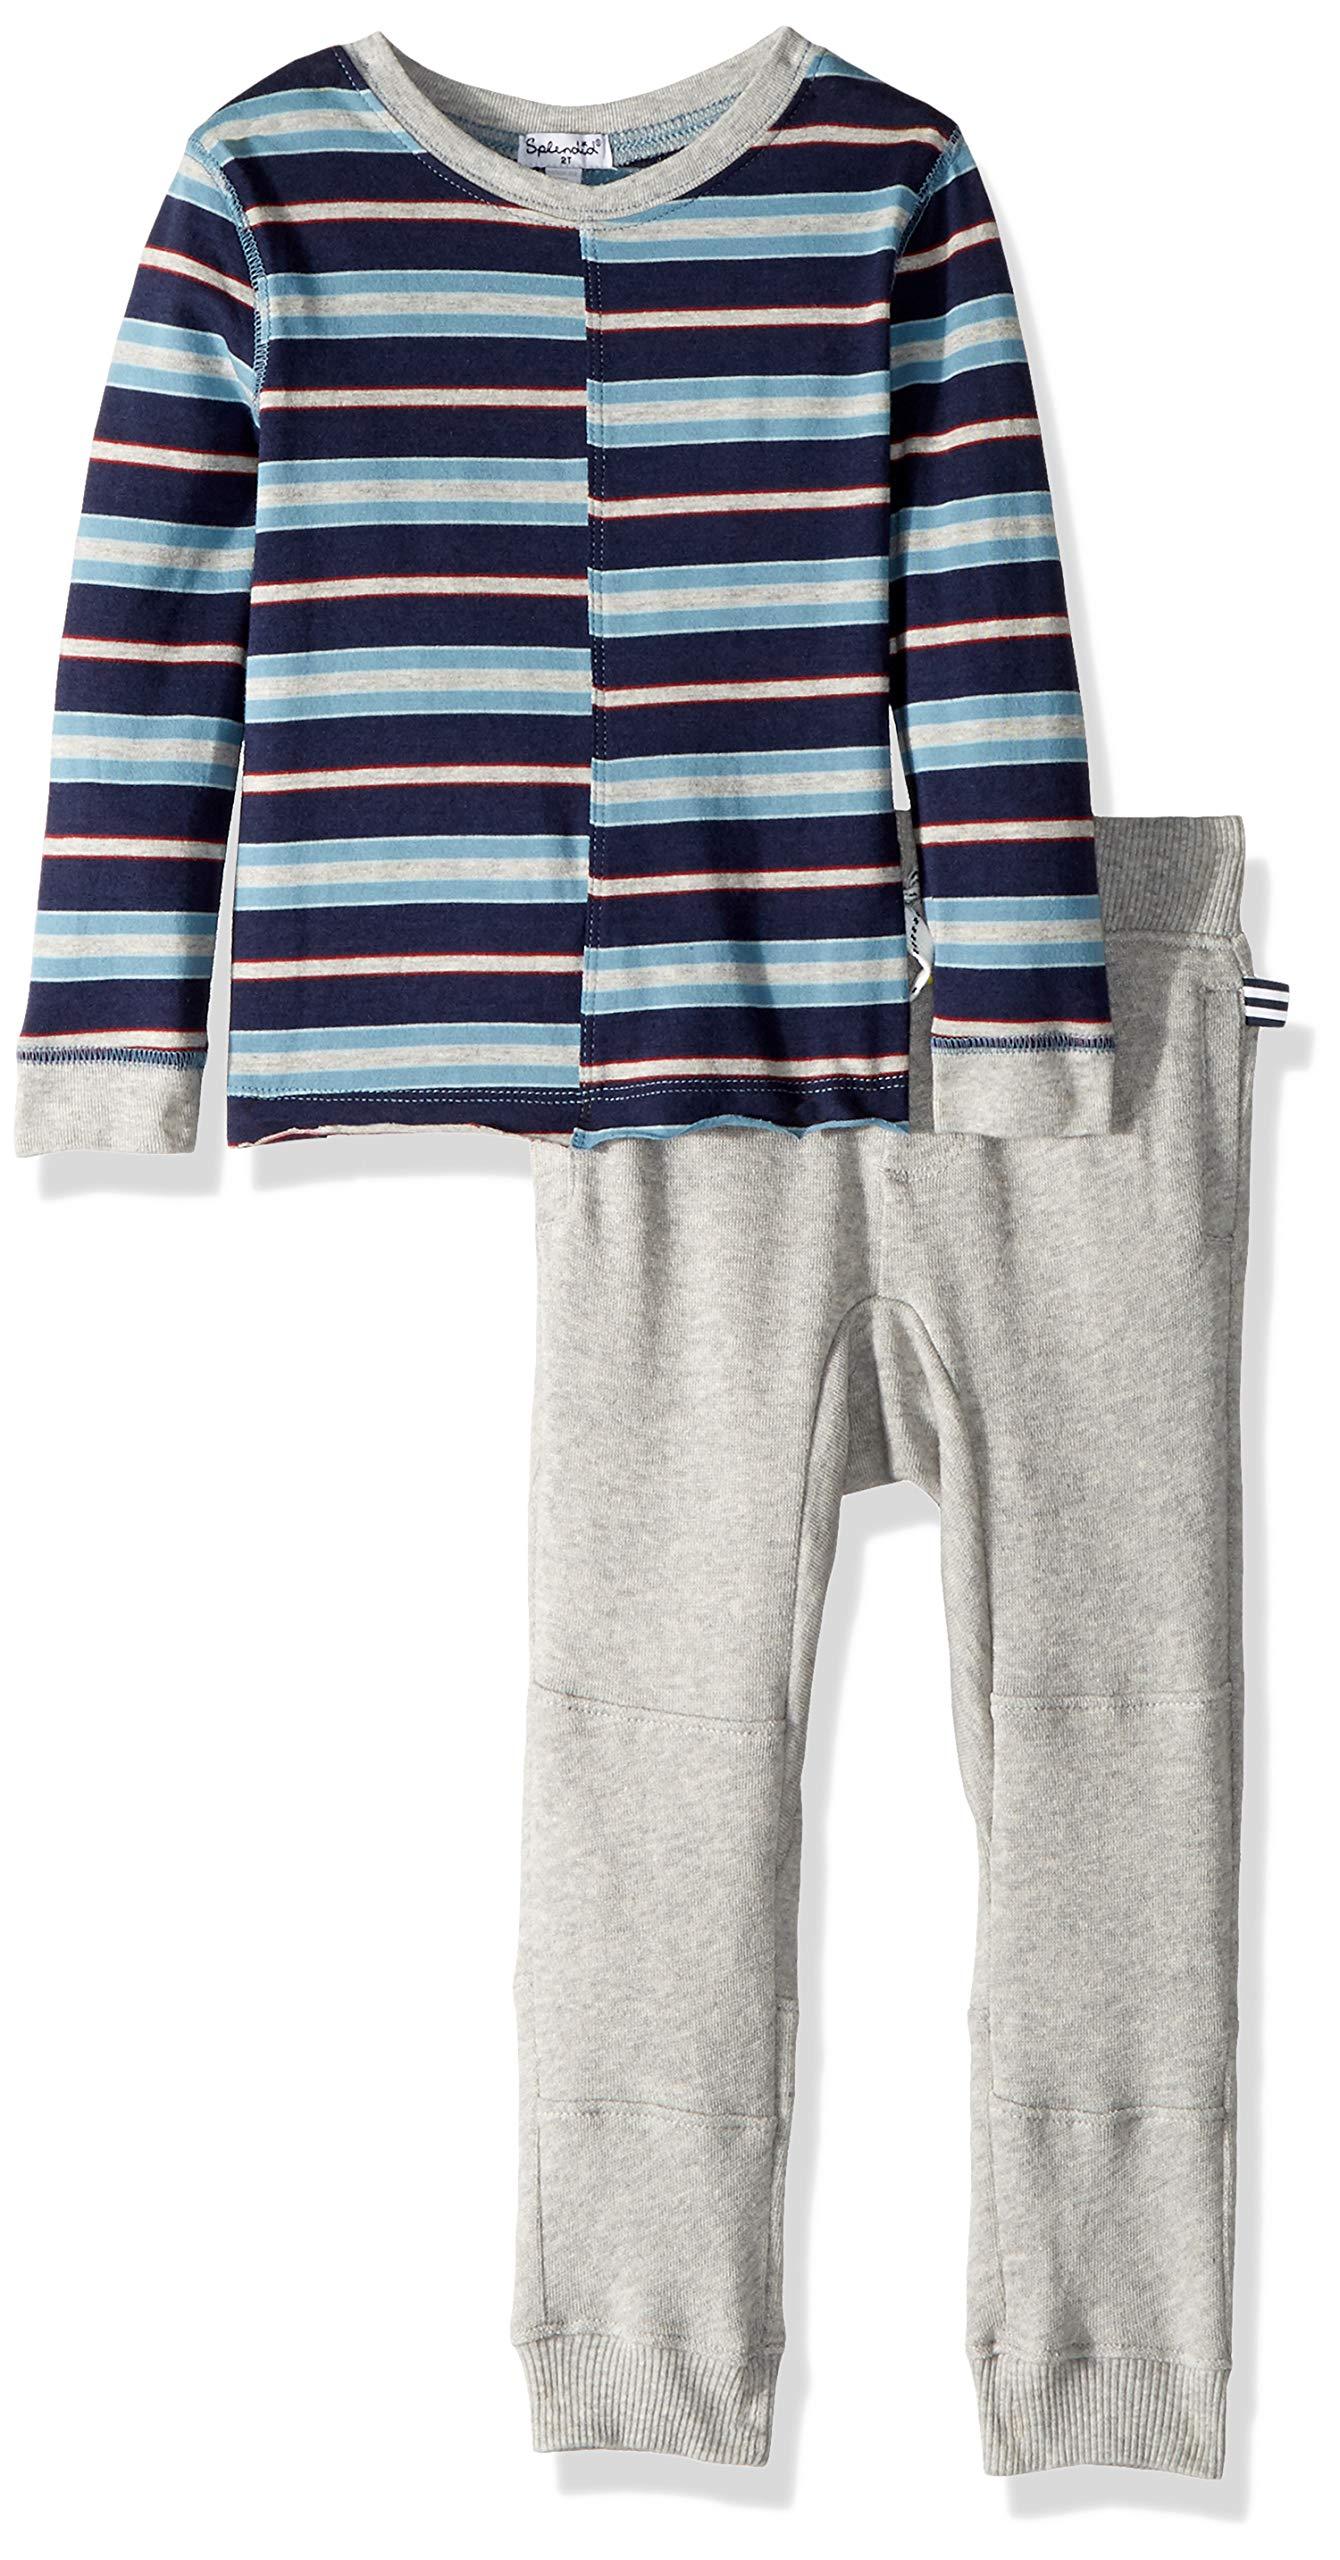 Splendid Toddler Boys' Yarn Dyed Jersey Long Sleeve Top Set, Light Grey Heather, 2T